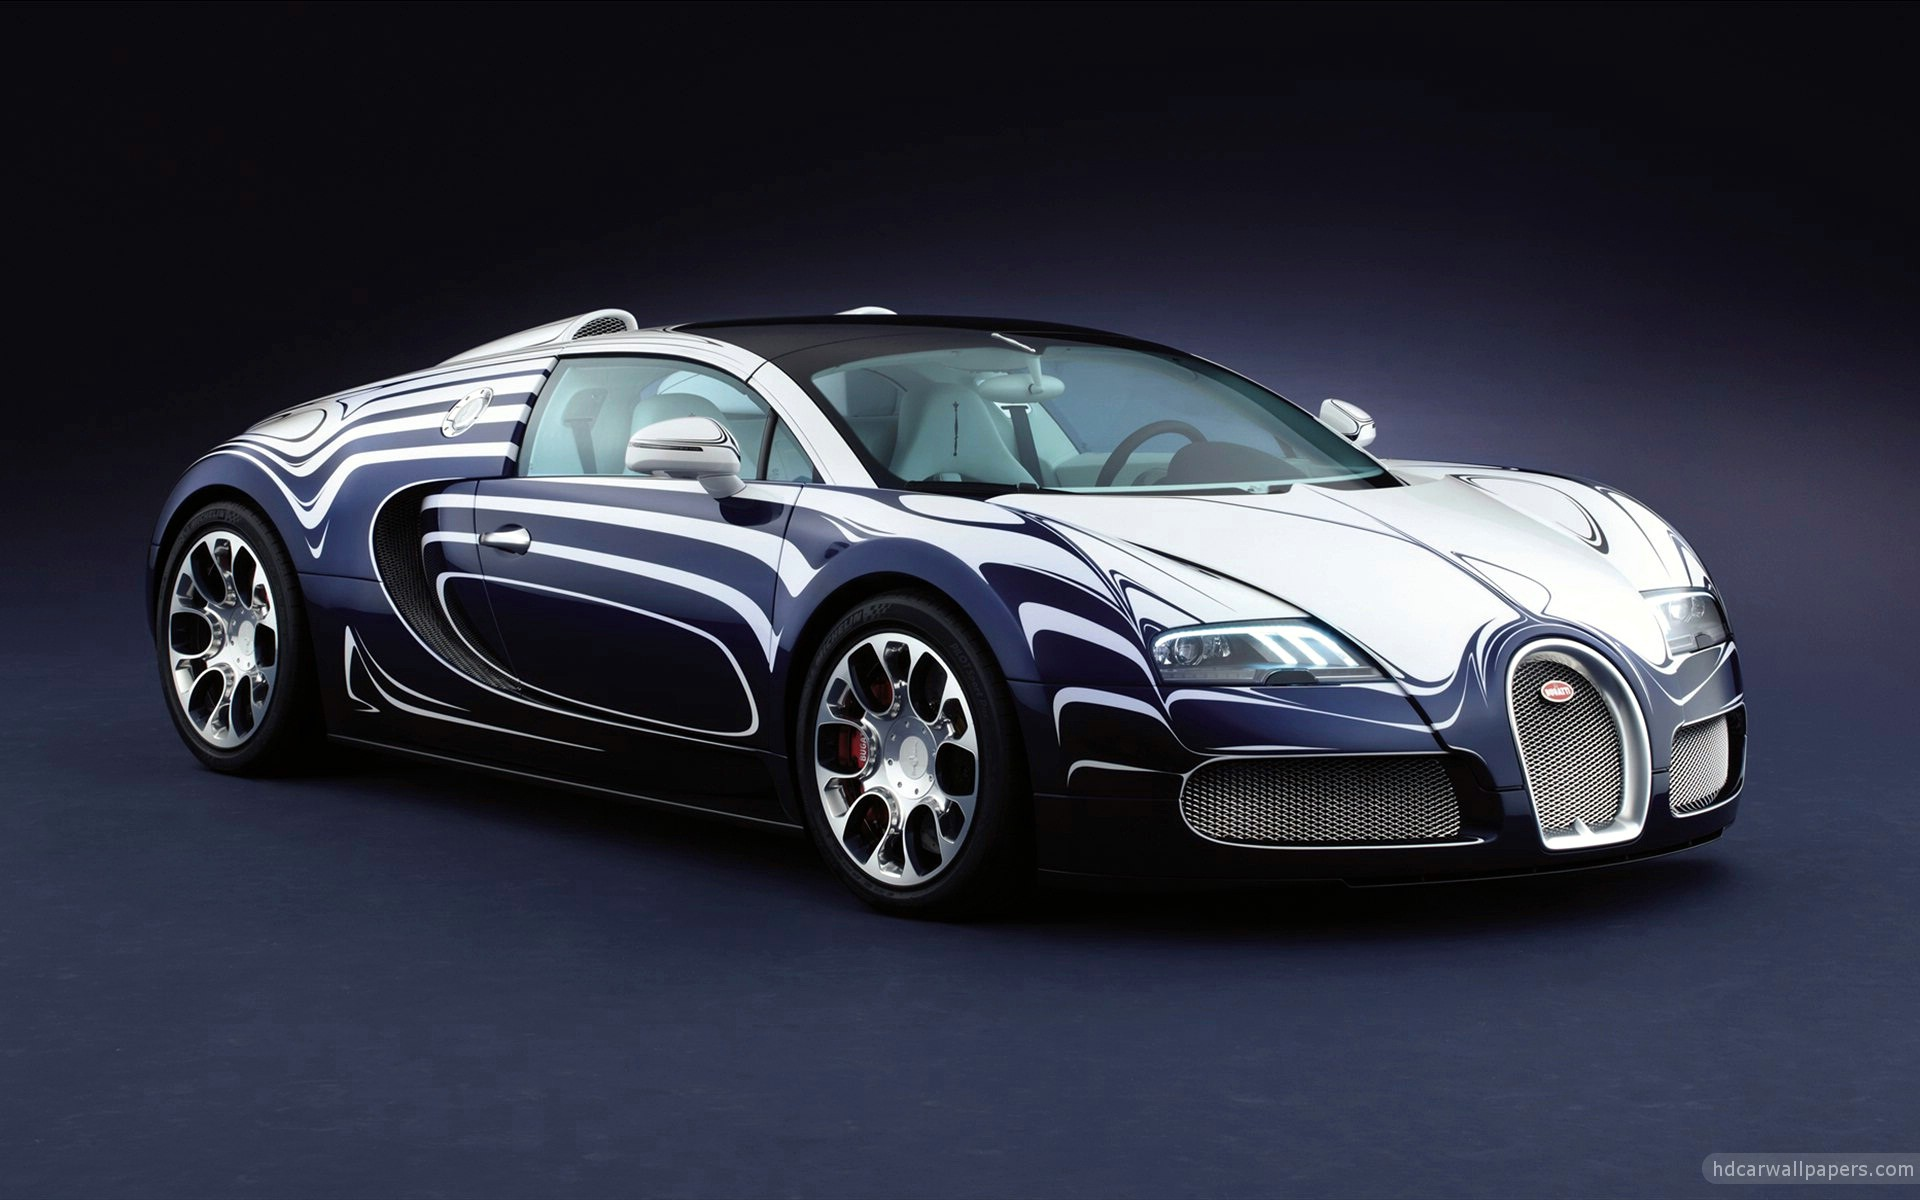 2011 Bugatti Veyron Grand Sport Wallpaper HD Car Wallpapers 1920x1200